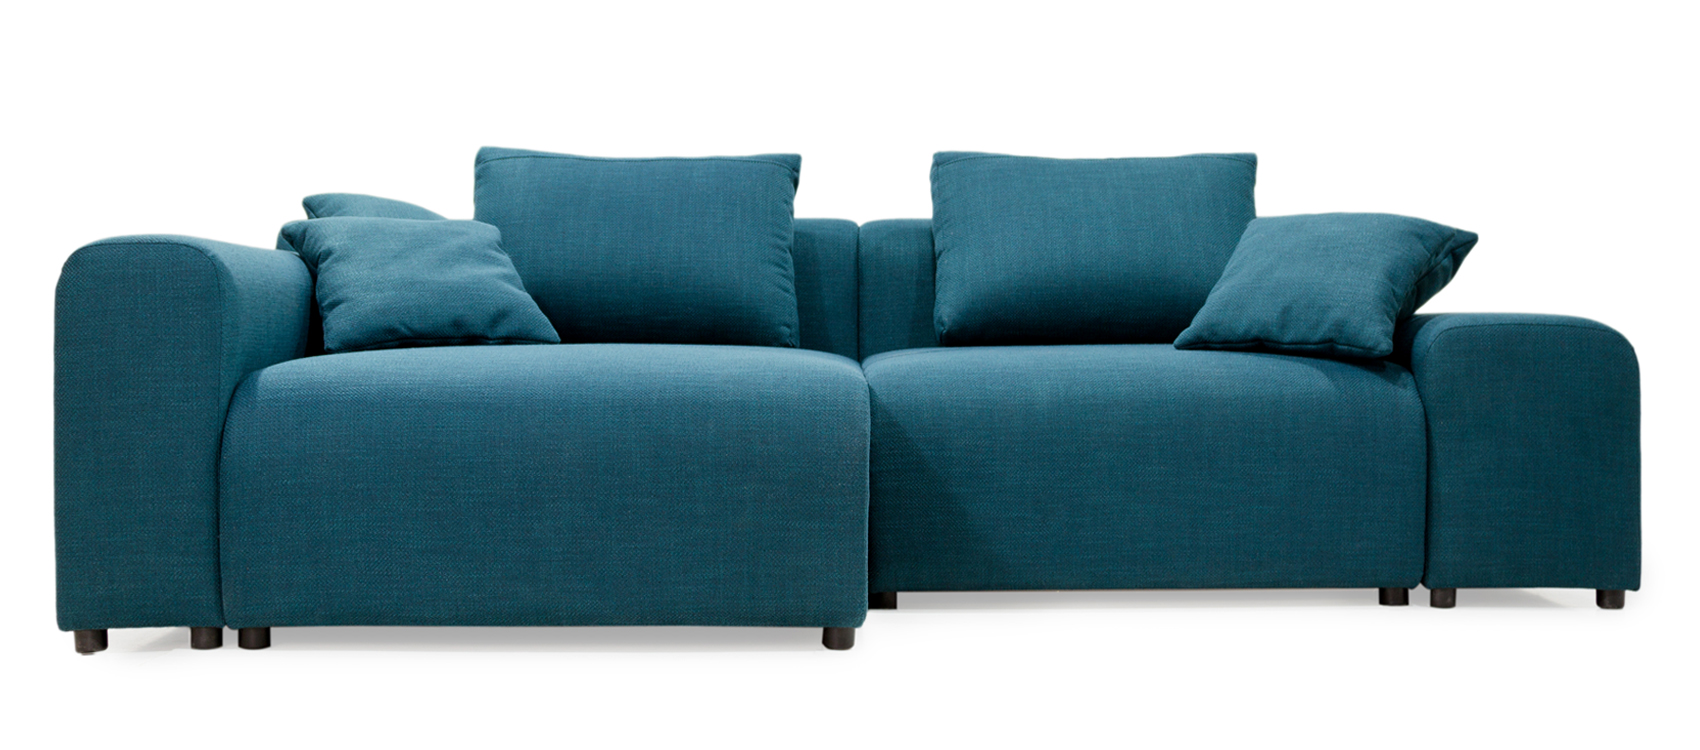 Sofa RAFT фото 1